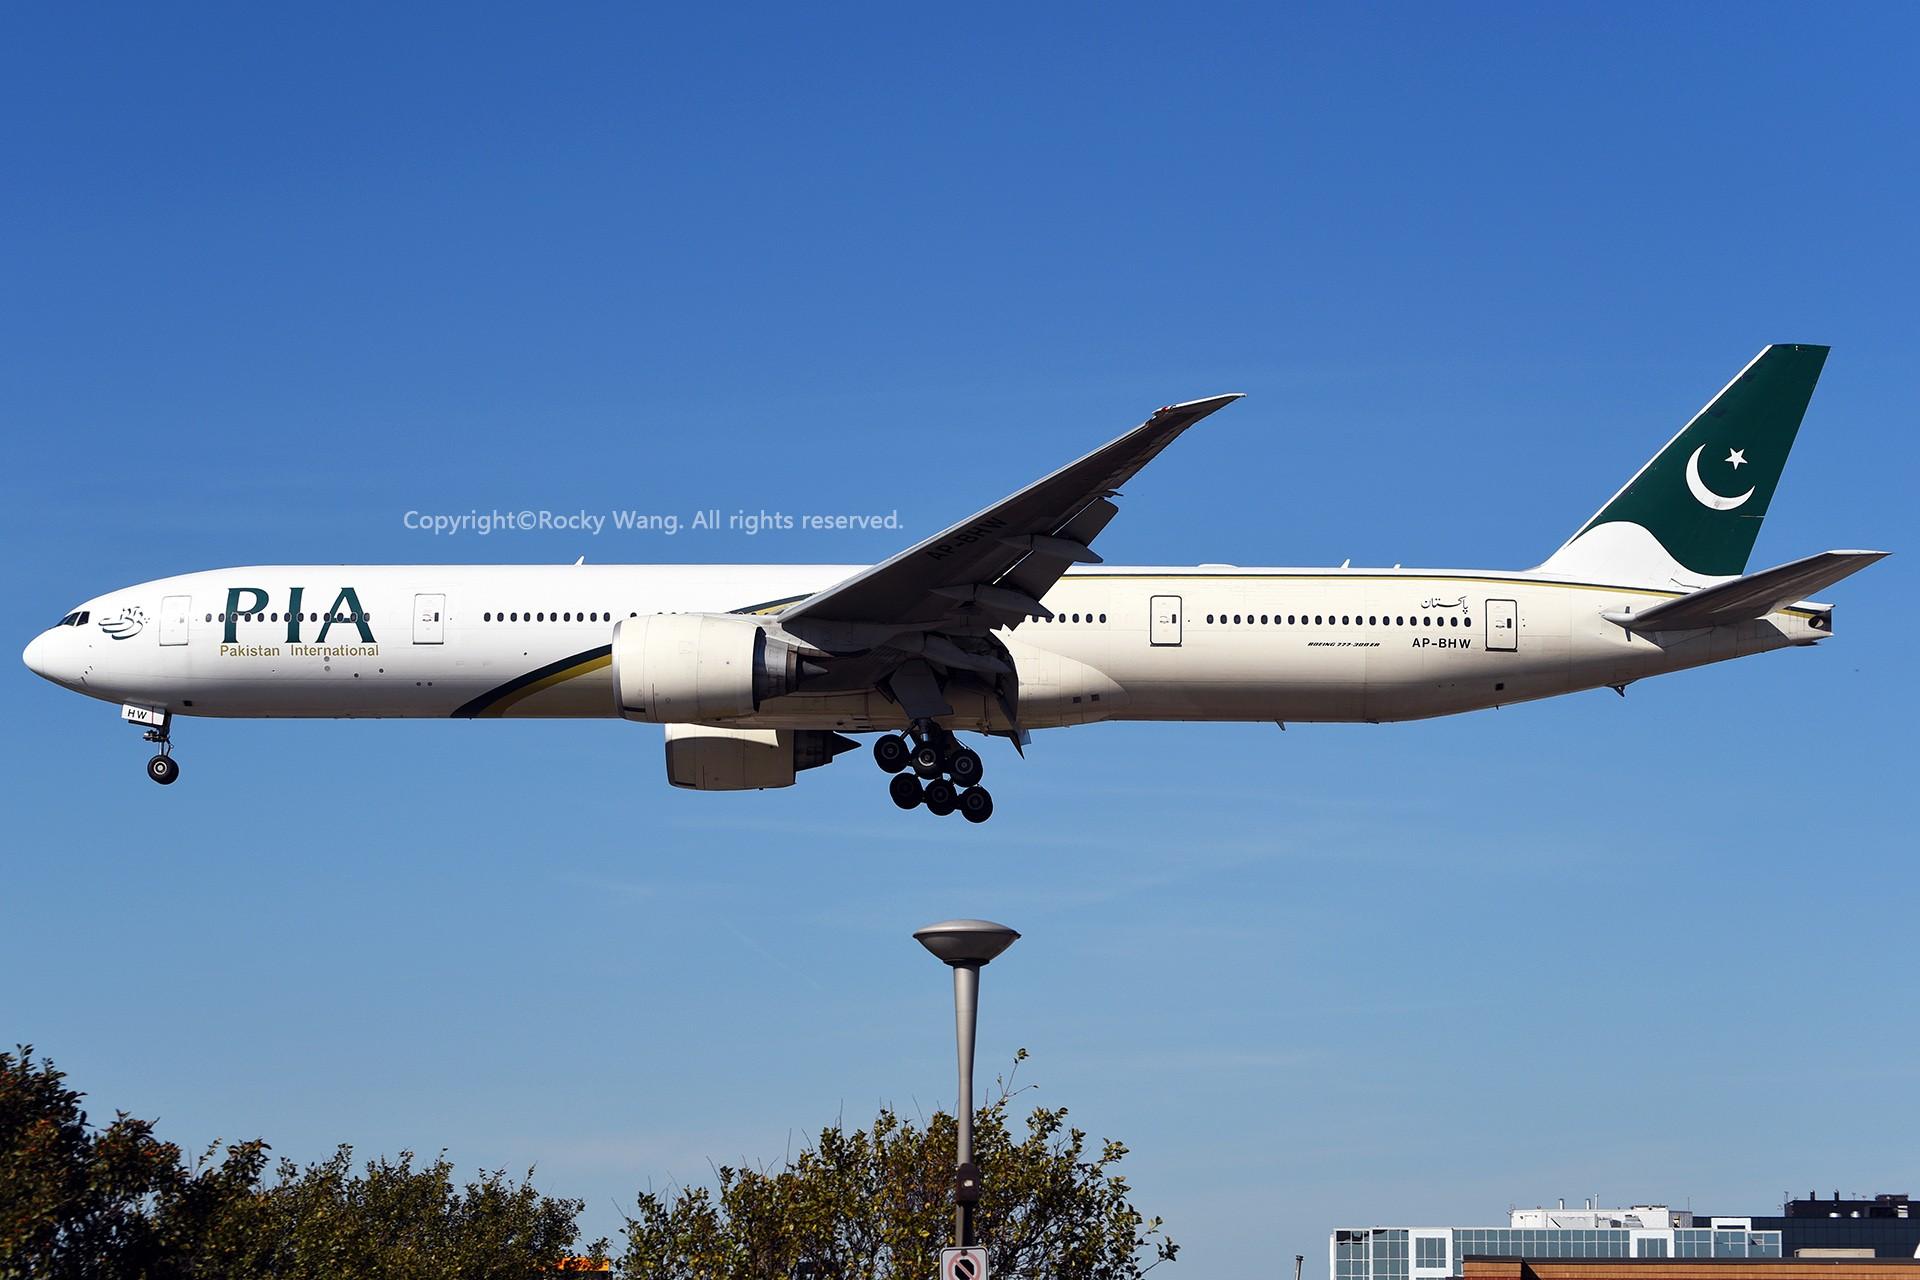 Re:[原创]CYYZ 30图 BOEING 777-340ER AP-BHW Toronto Lester B. Pearson Int'l Airport